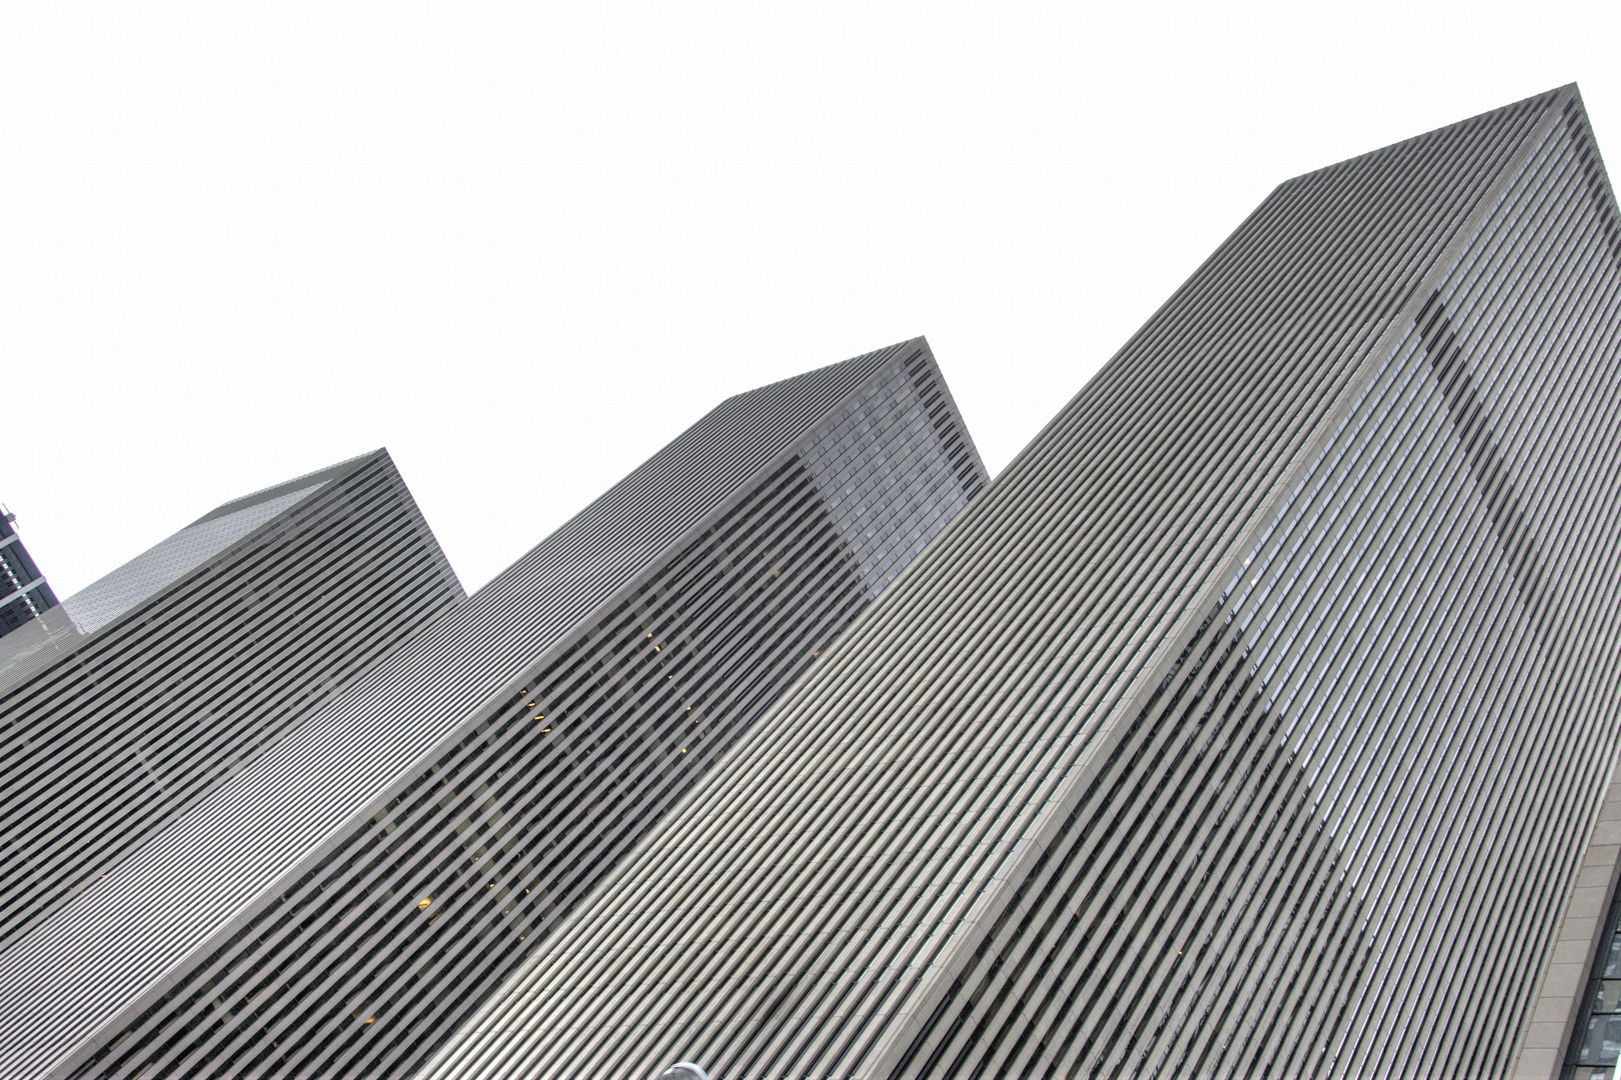 New York - 6th Avenue - 02